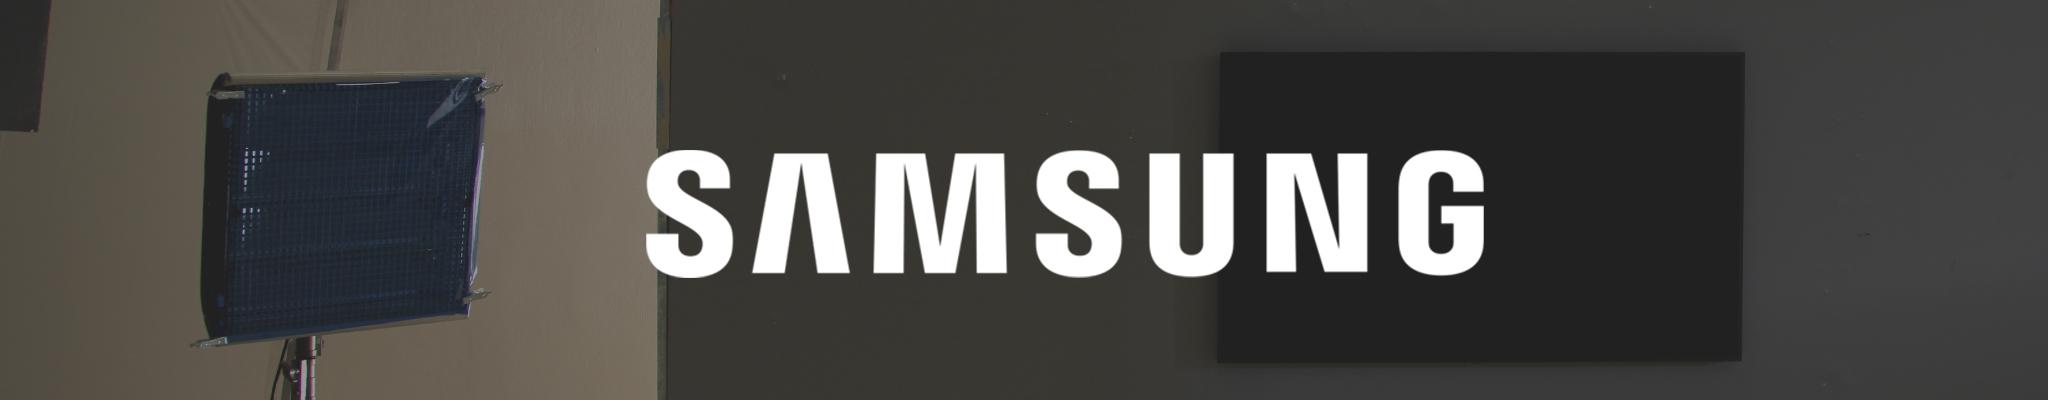 Samsung 'The Frame' - Pickled.